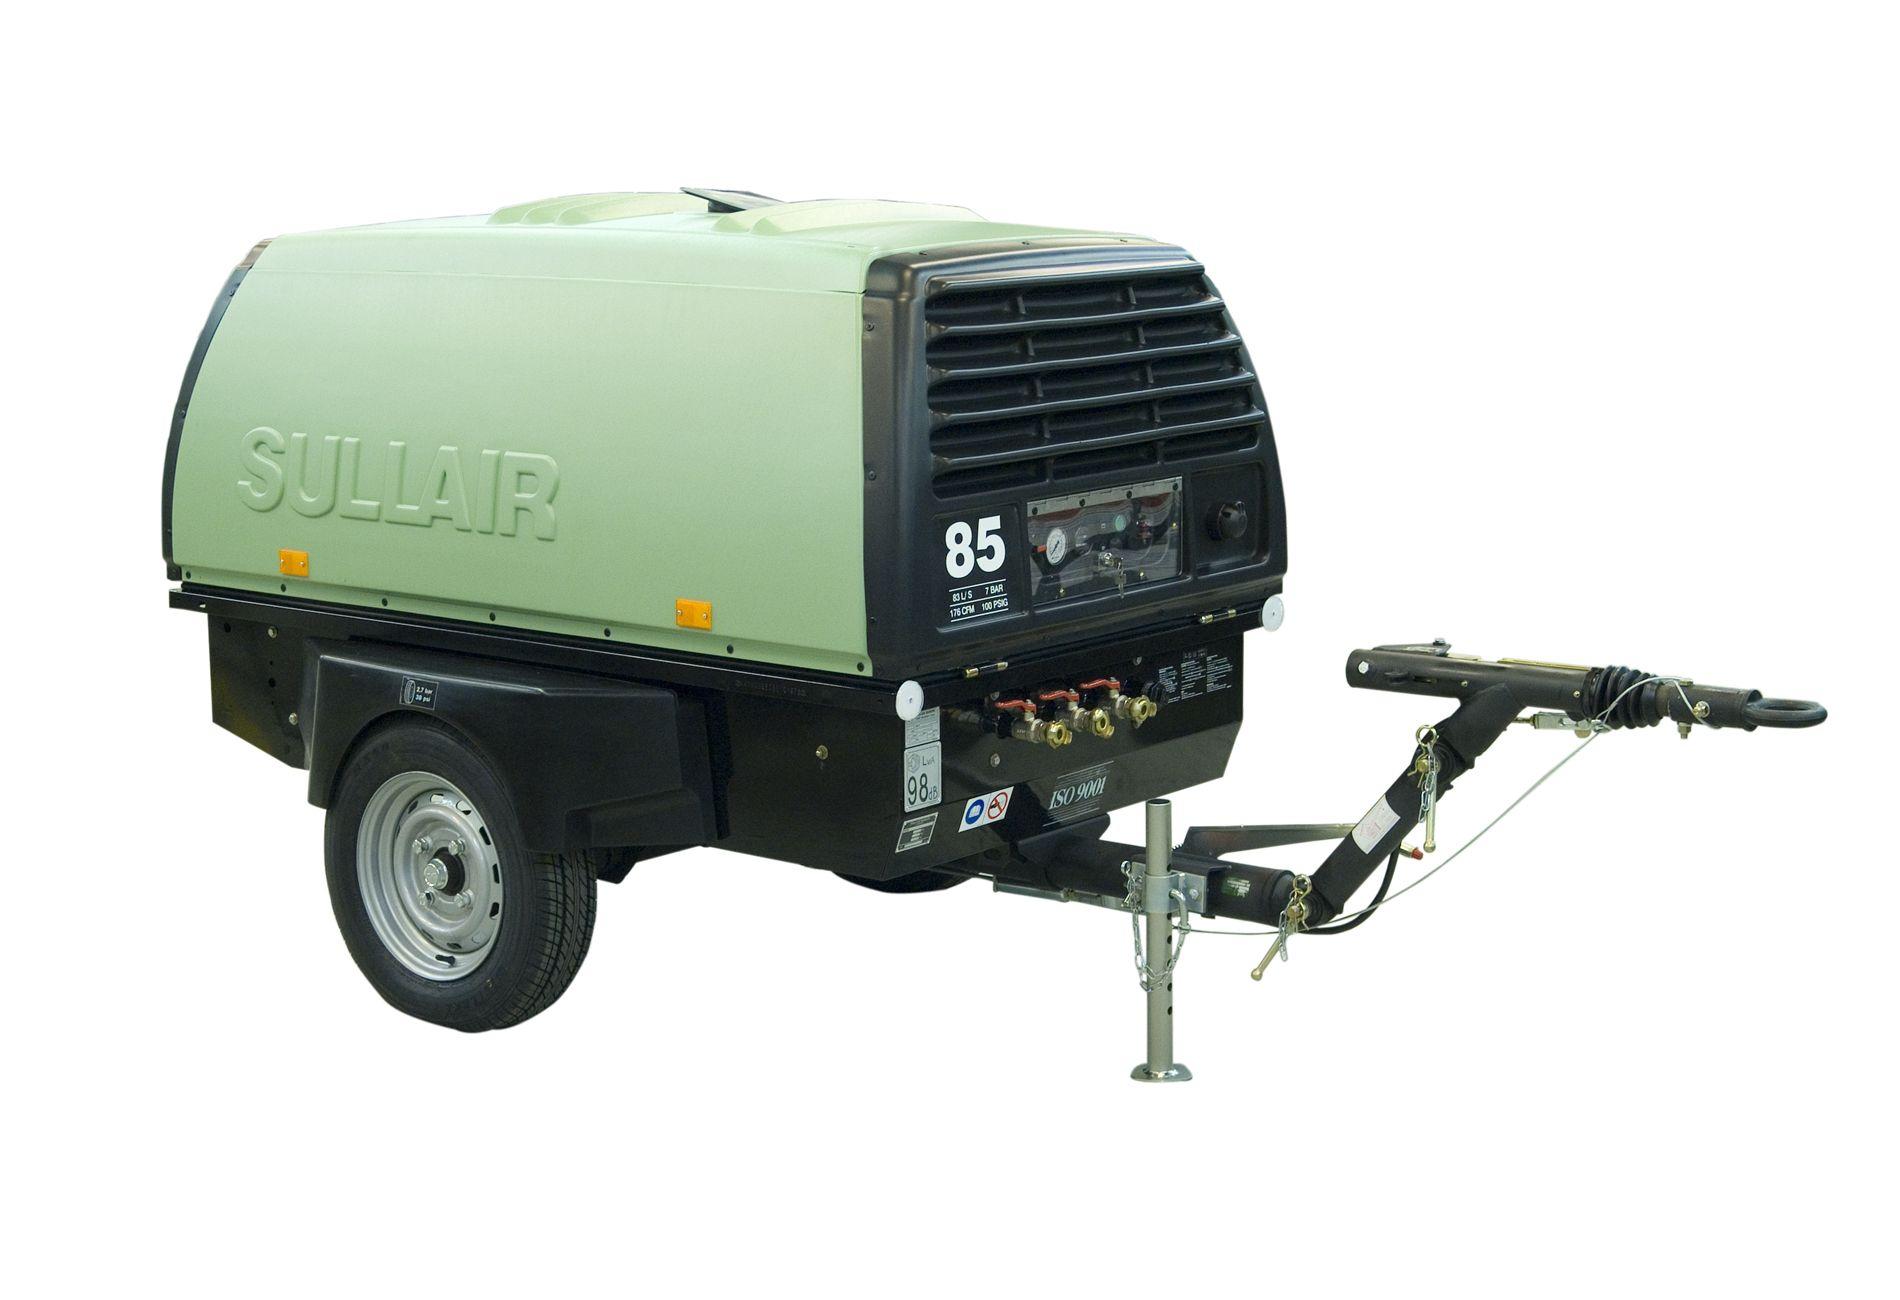 HOLT CAT TX sells generators, earthmoving